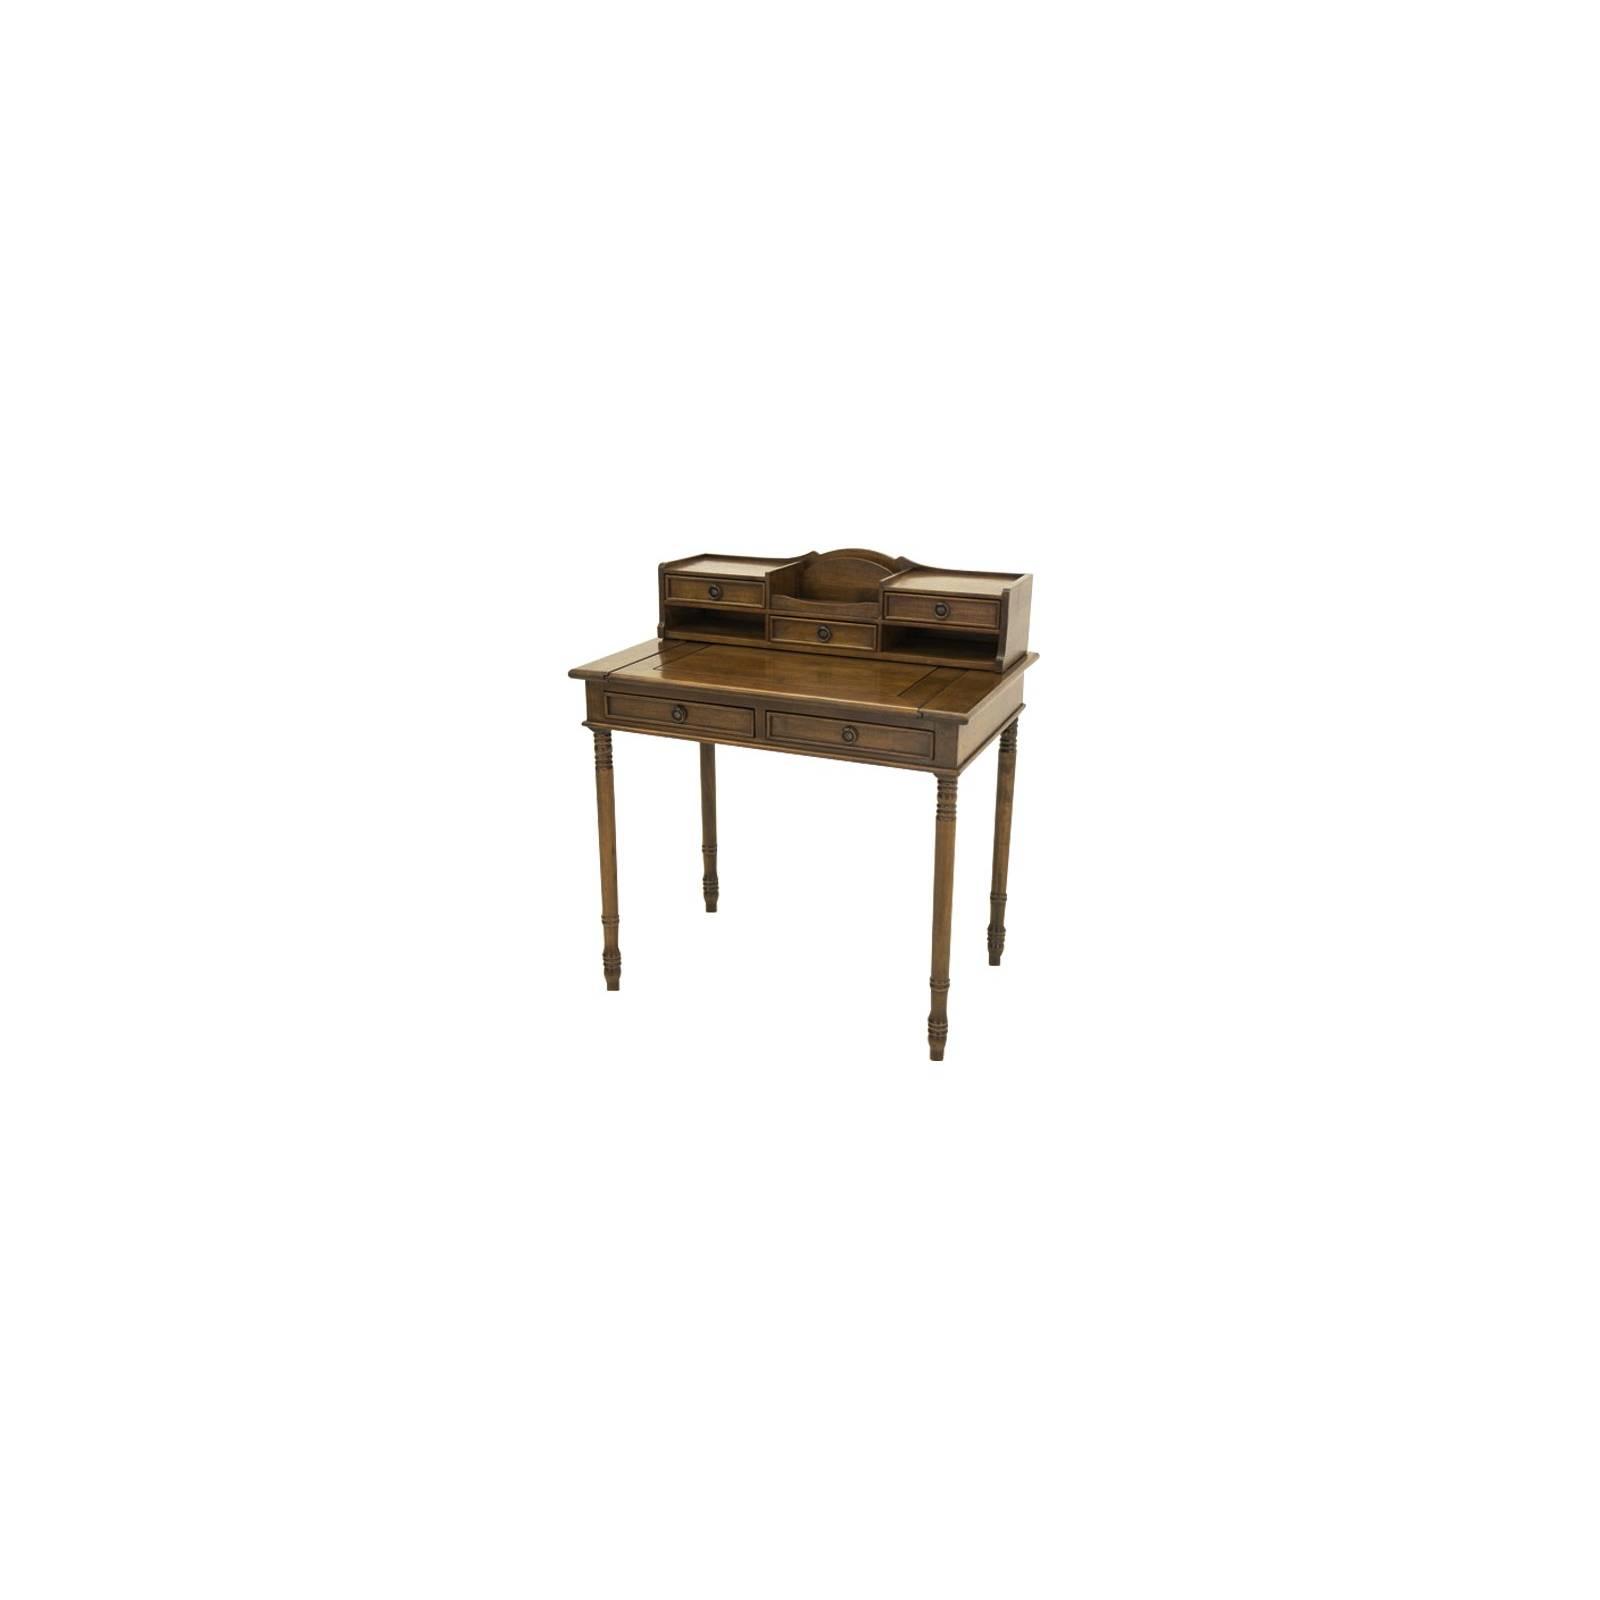 Bureau Charme Hévéa - meuble style classique